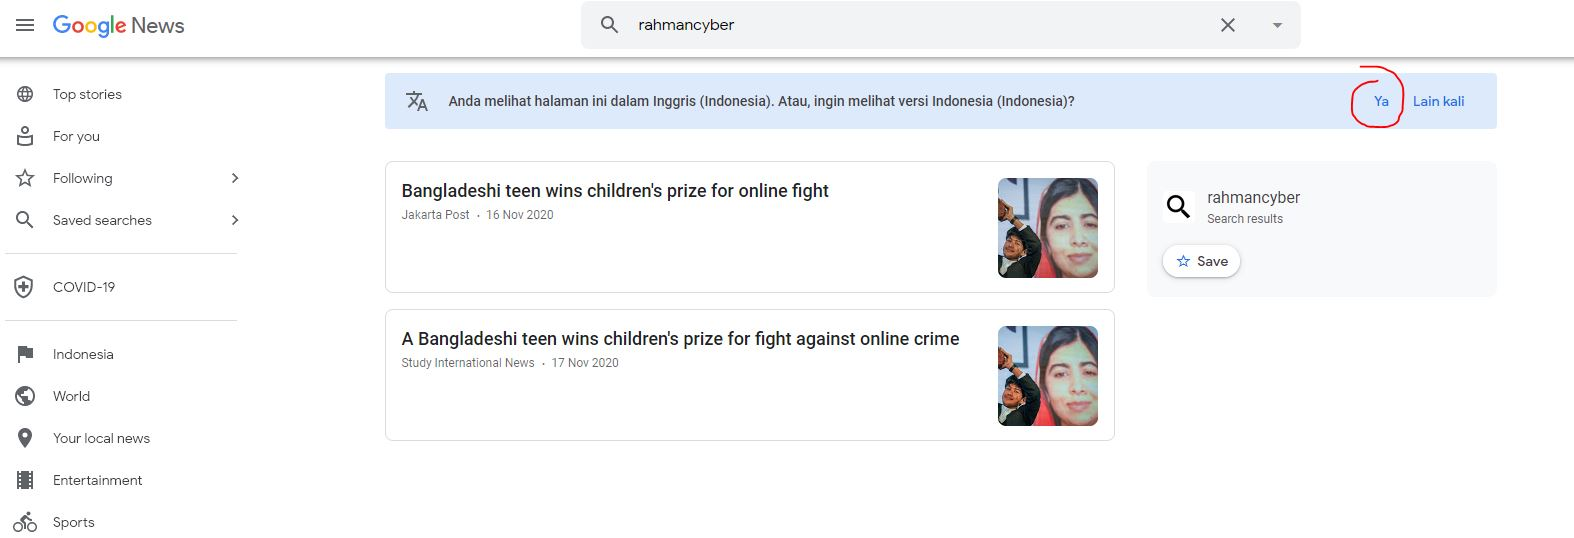 Pencarian Google News